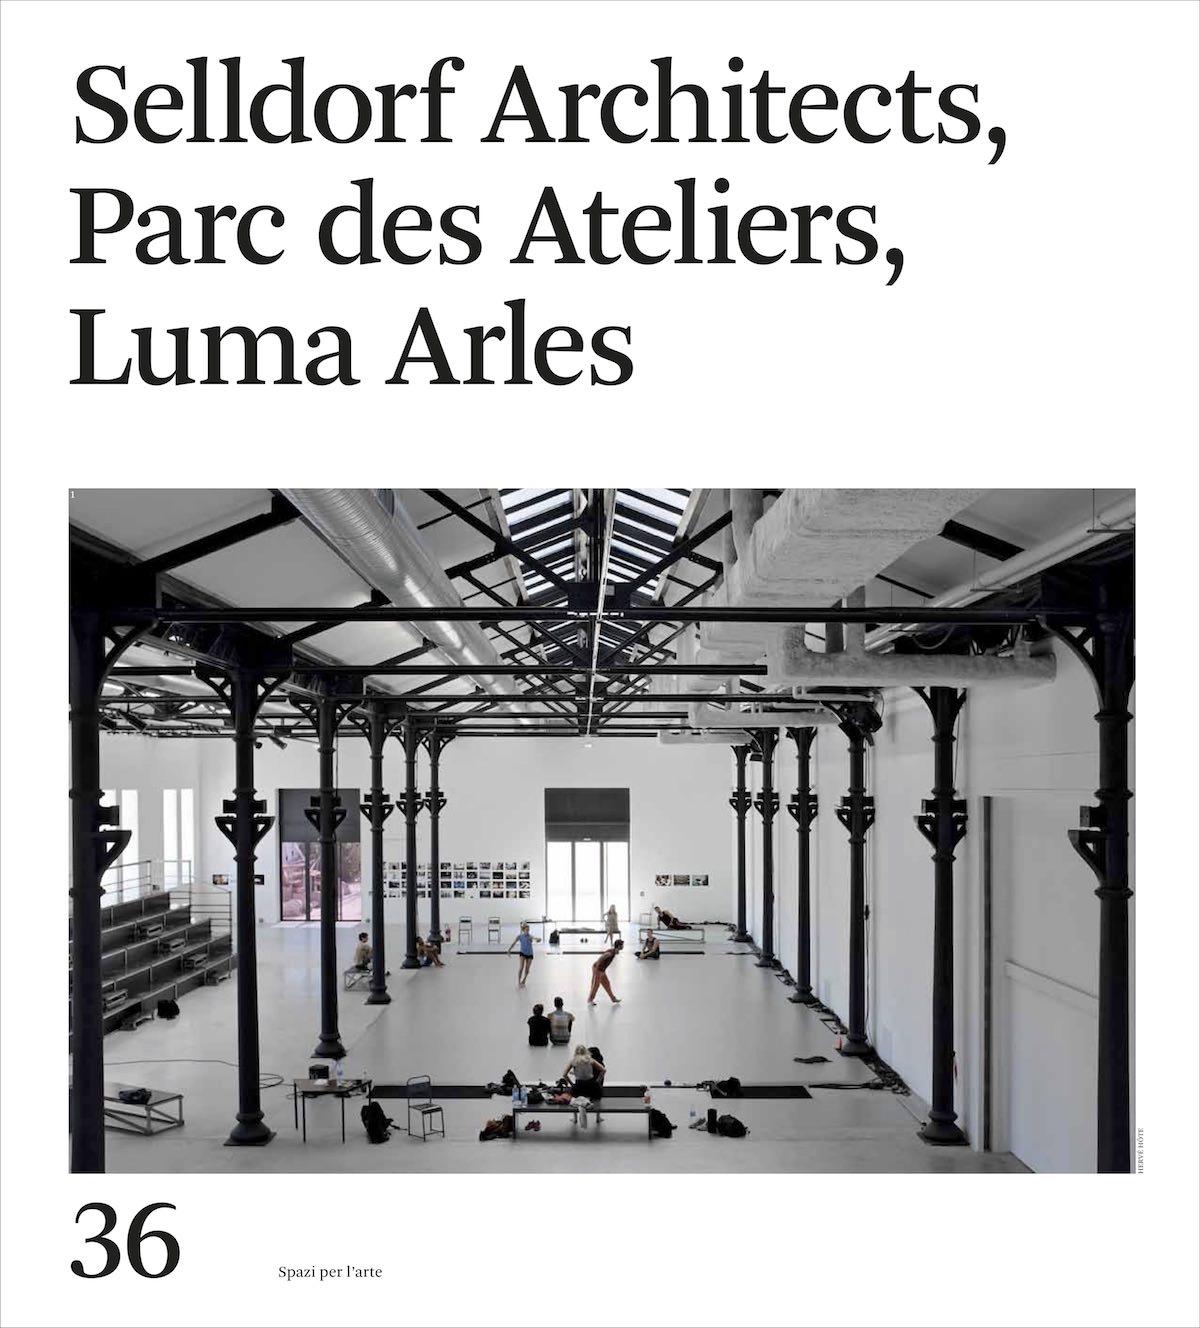 894 SELLDORF ARCHITECTS